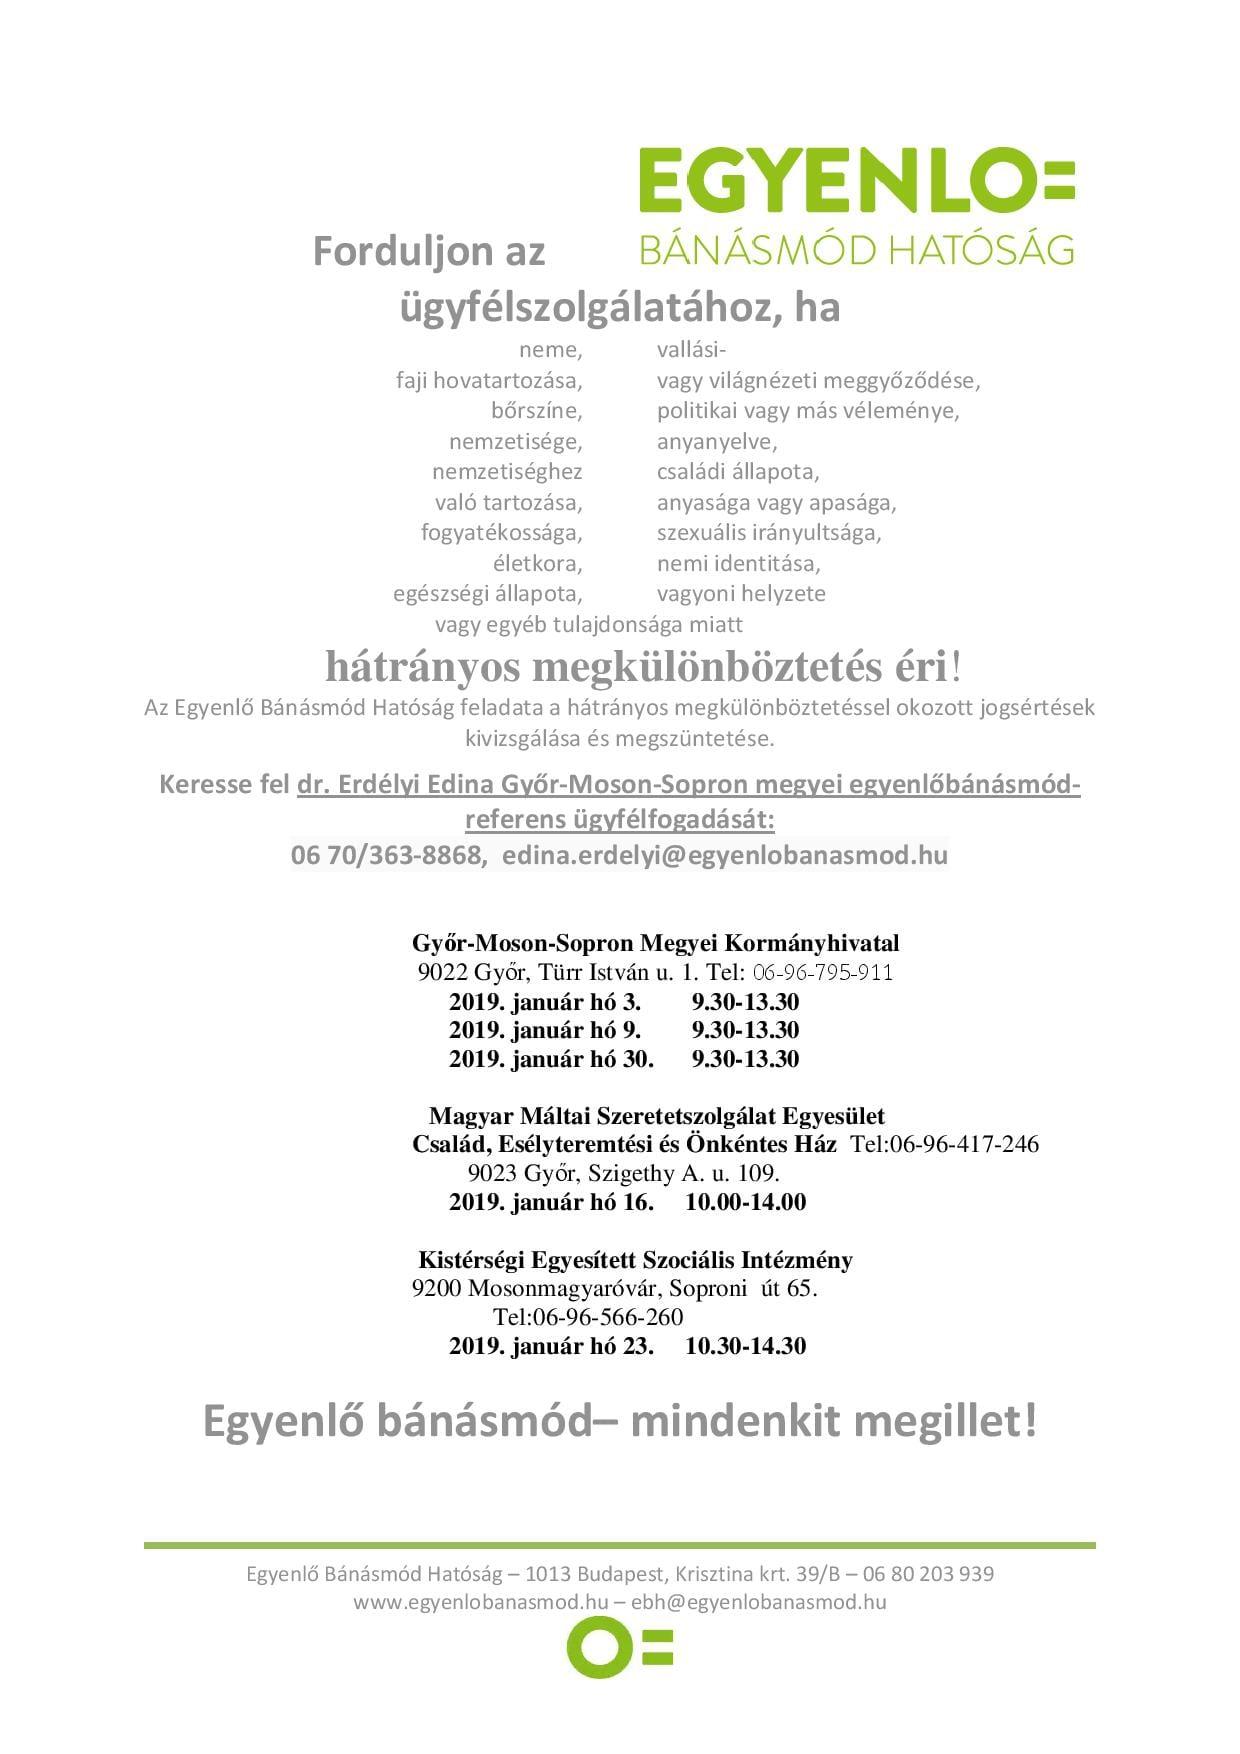 ügyfélfogadási plakát_jan2019-page-001